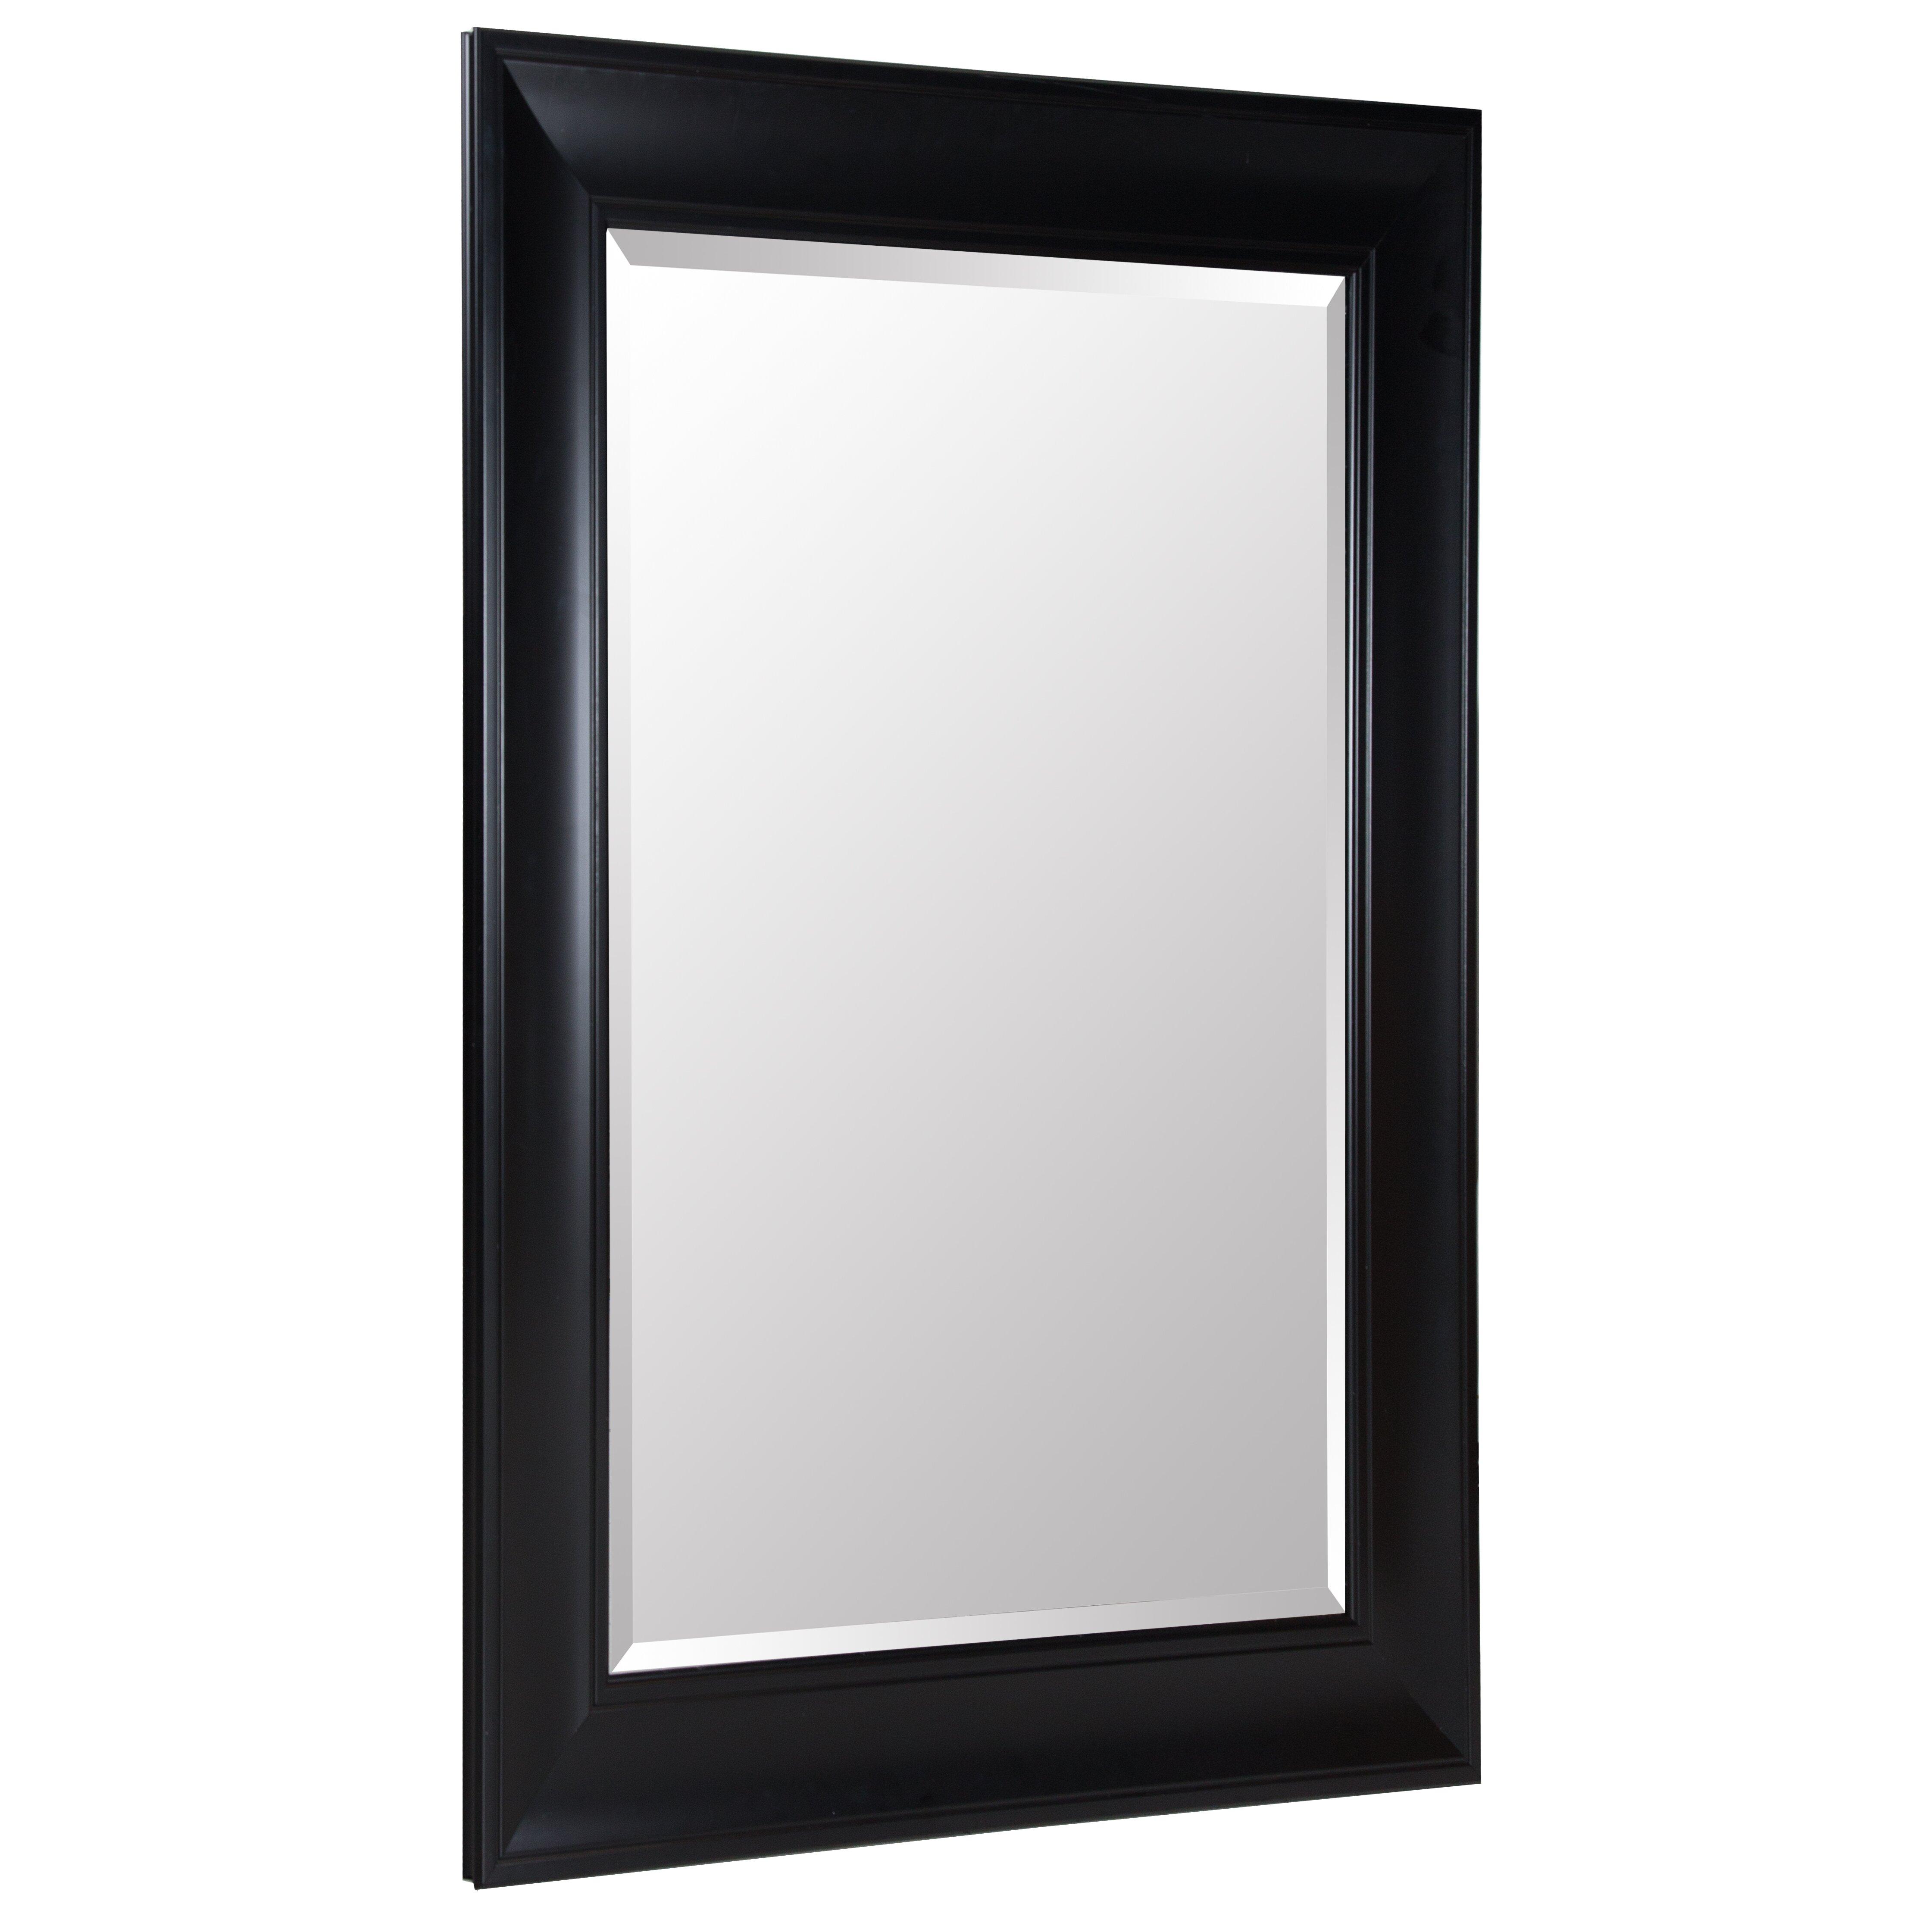 Nielsenbainbridge gallery solutions beveled wall mirror for Mirror gallery wall